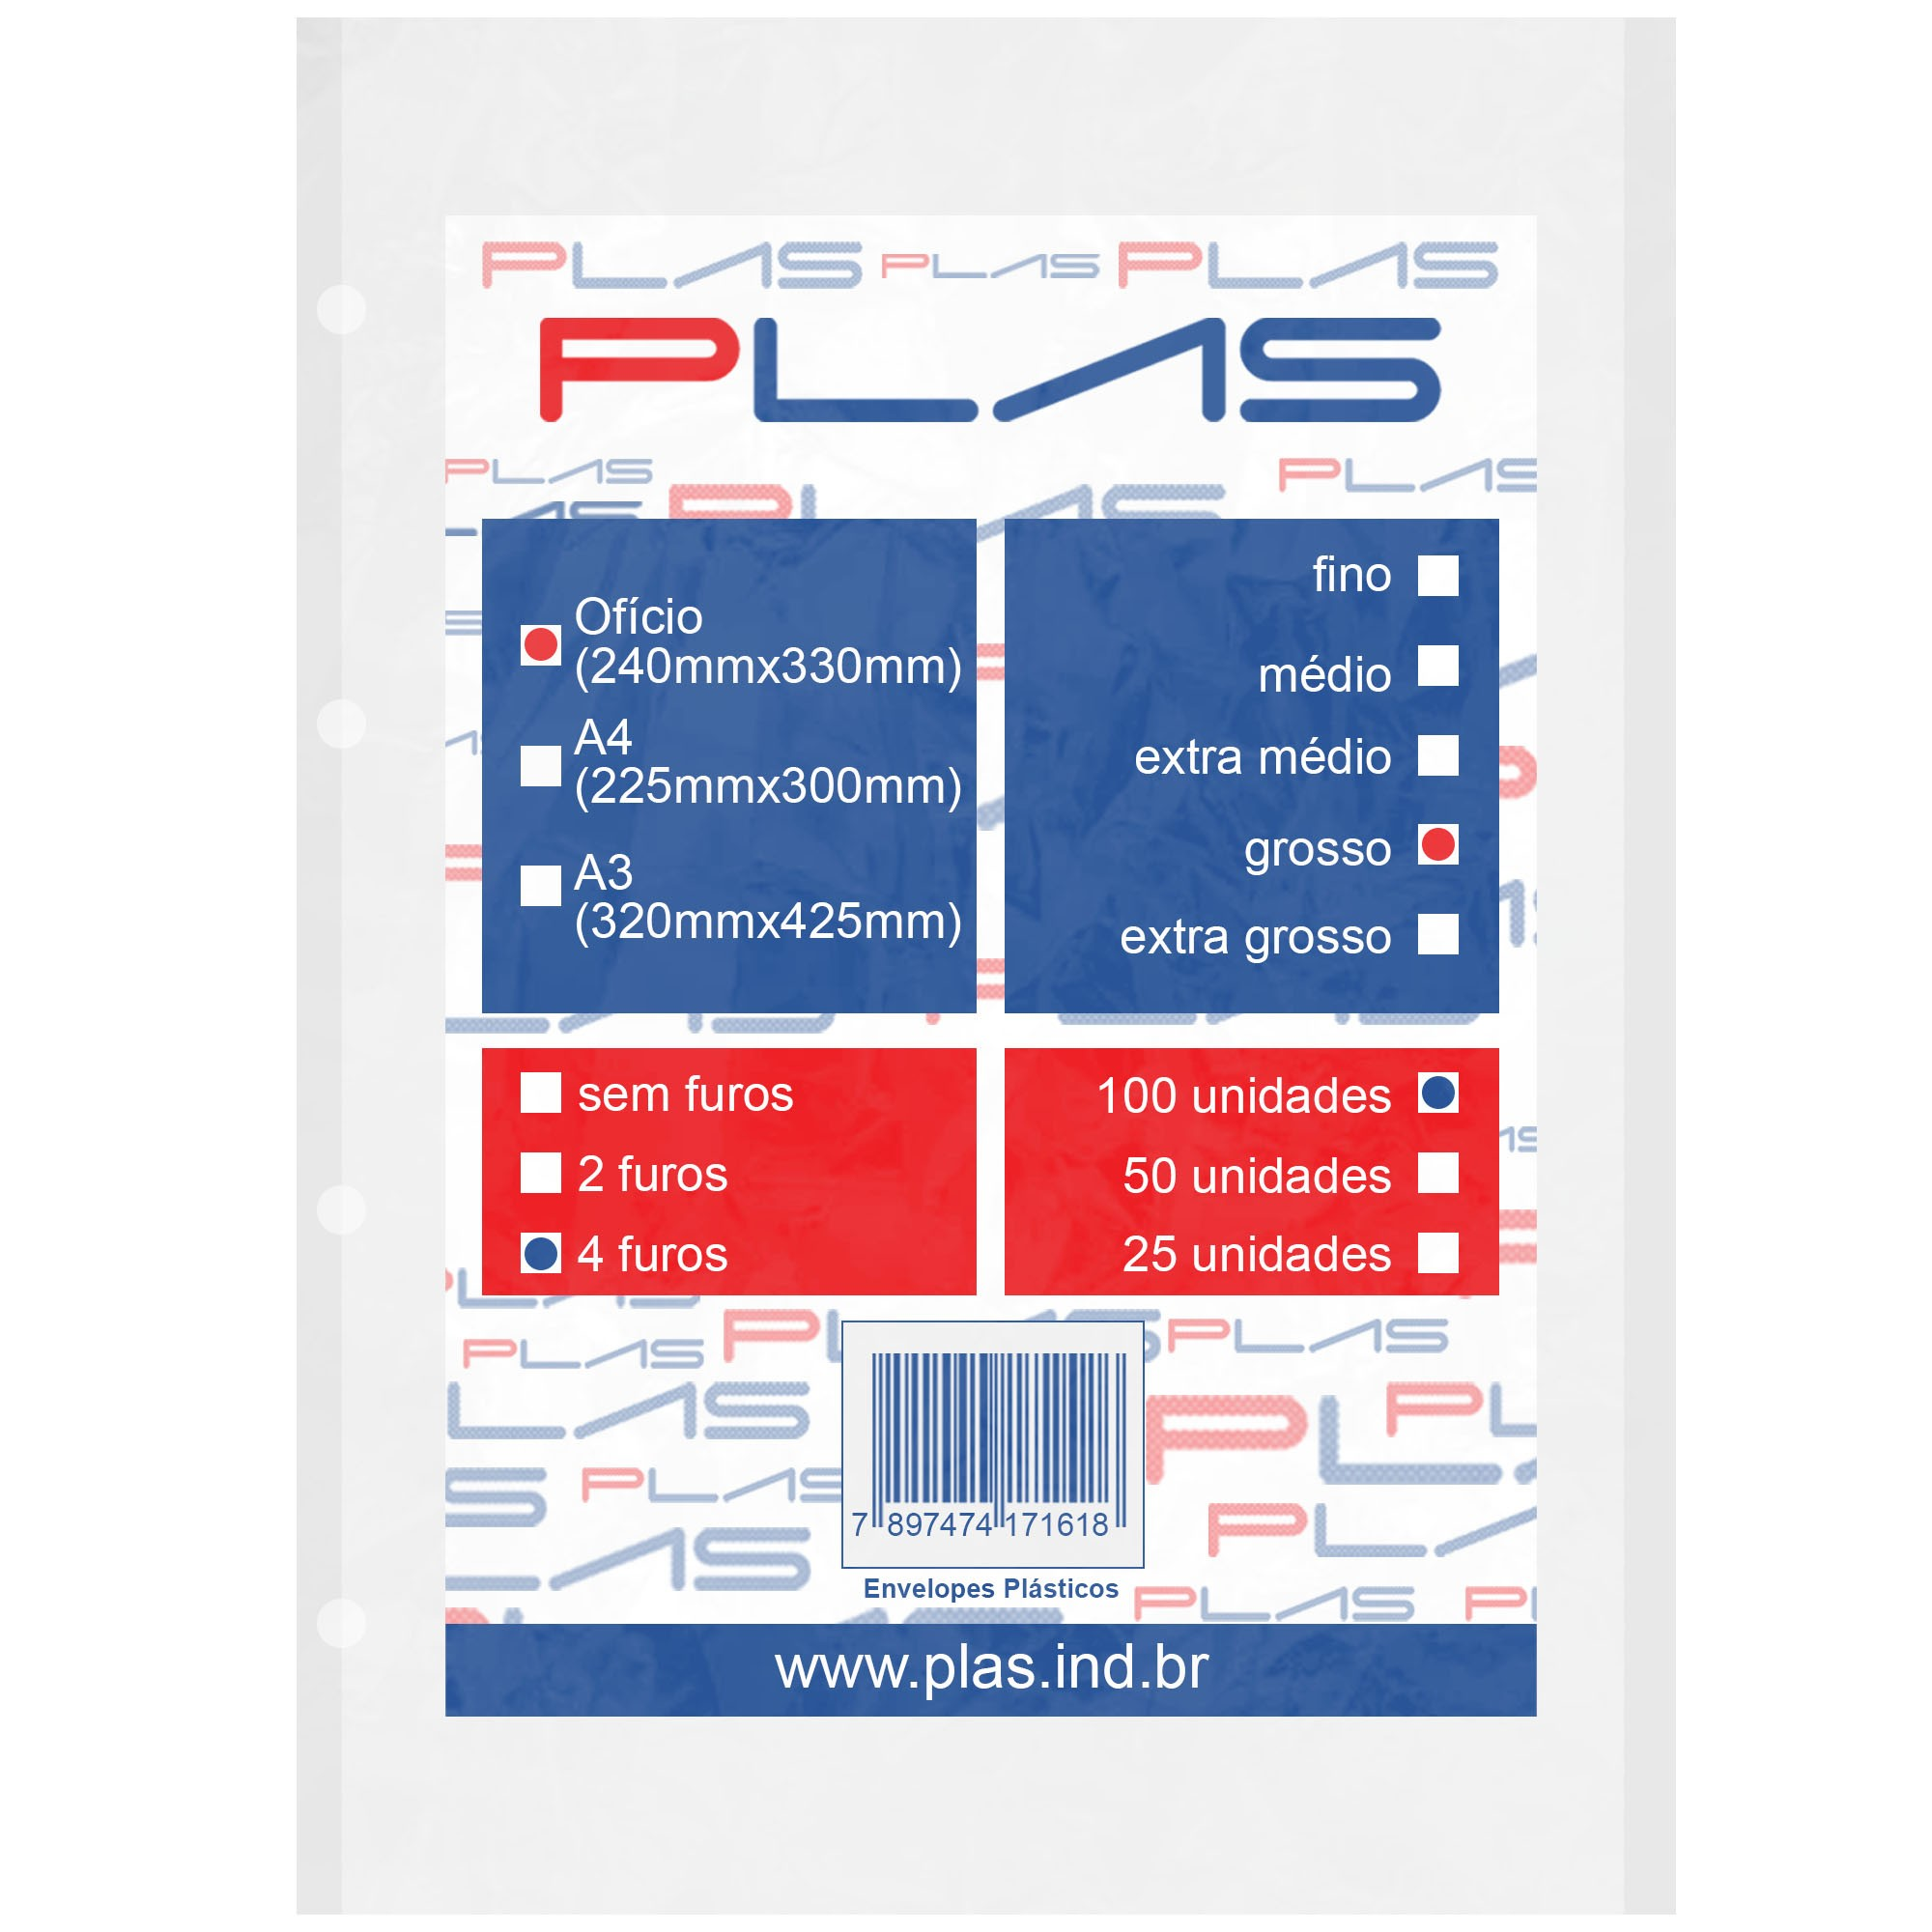 Envelope Saco Plastico tamanho Oficio 4 furos Grosso pct c/ 100 un - Iplas